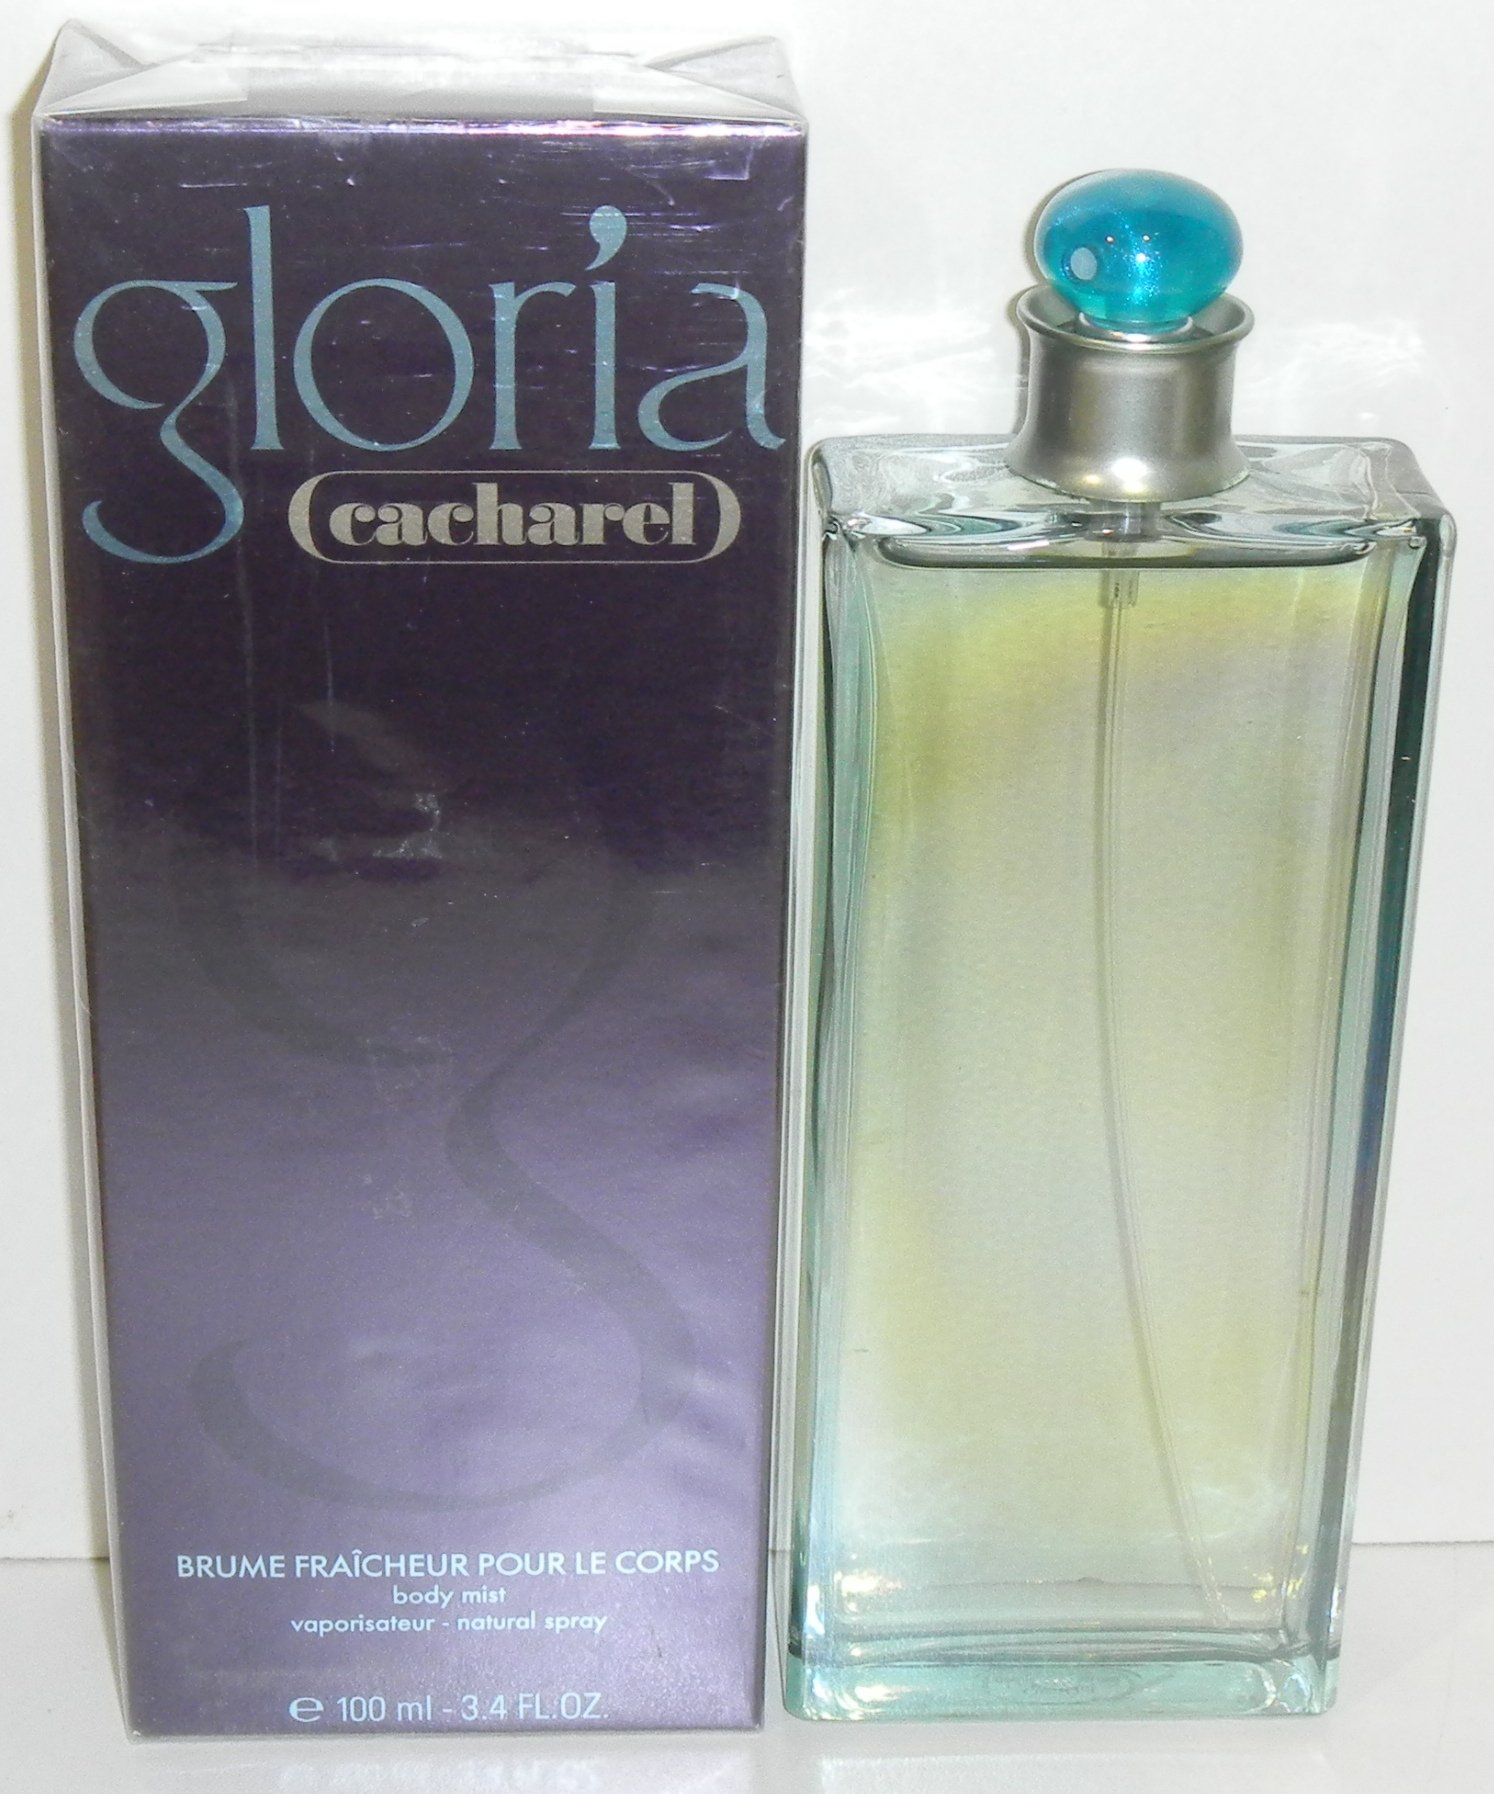 Cacharel Gloria Body Mist Natural Spray 100 Ml / 3.4 Oz.